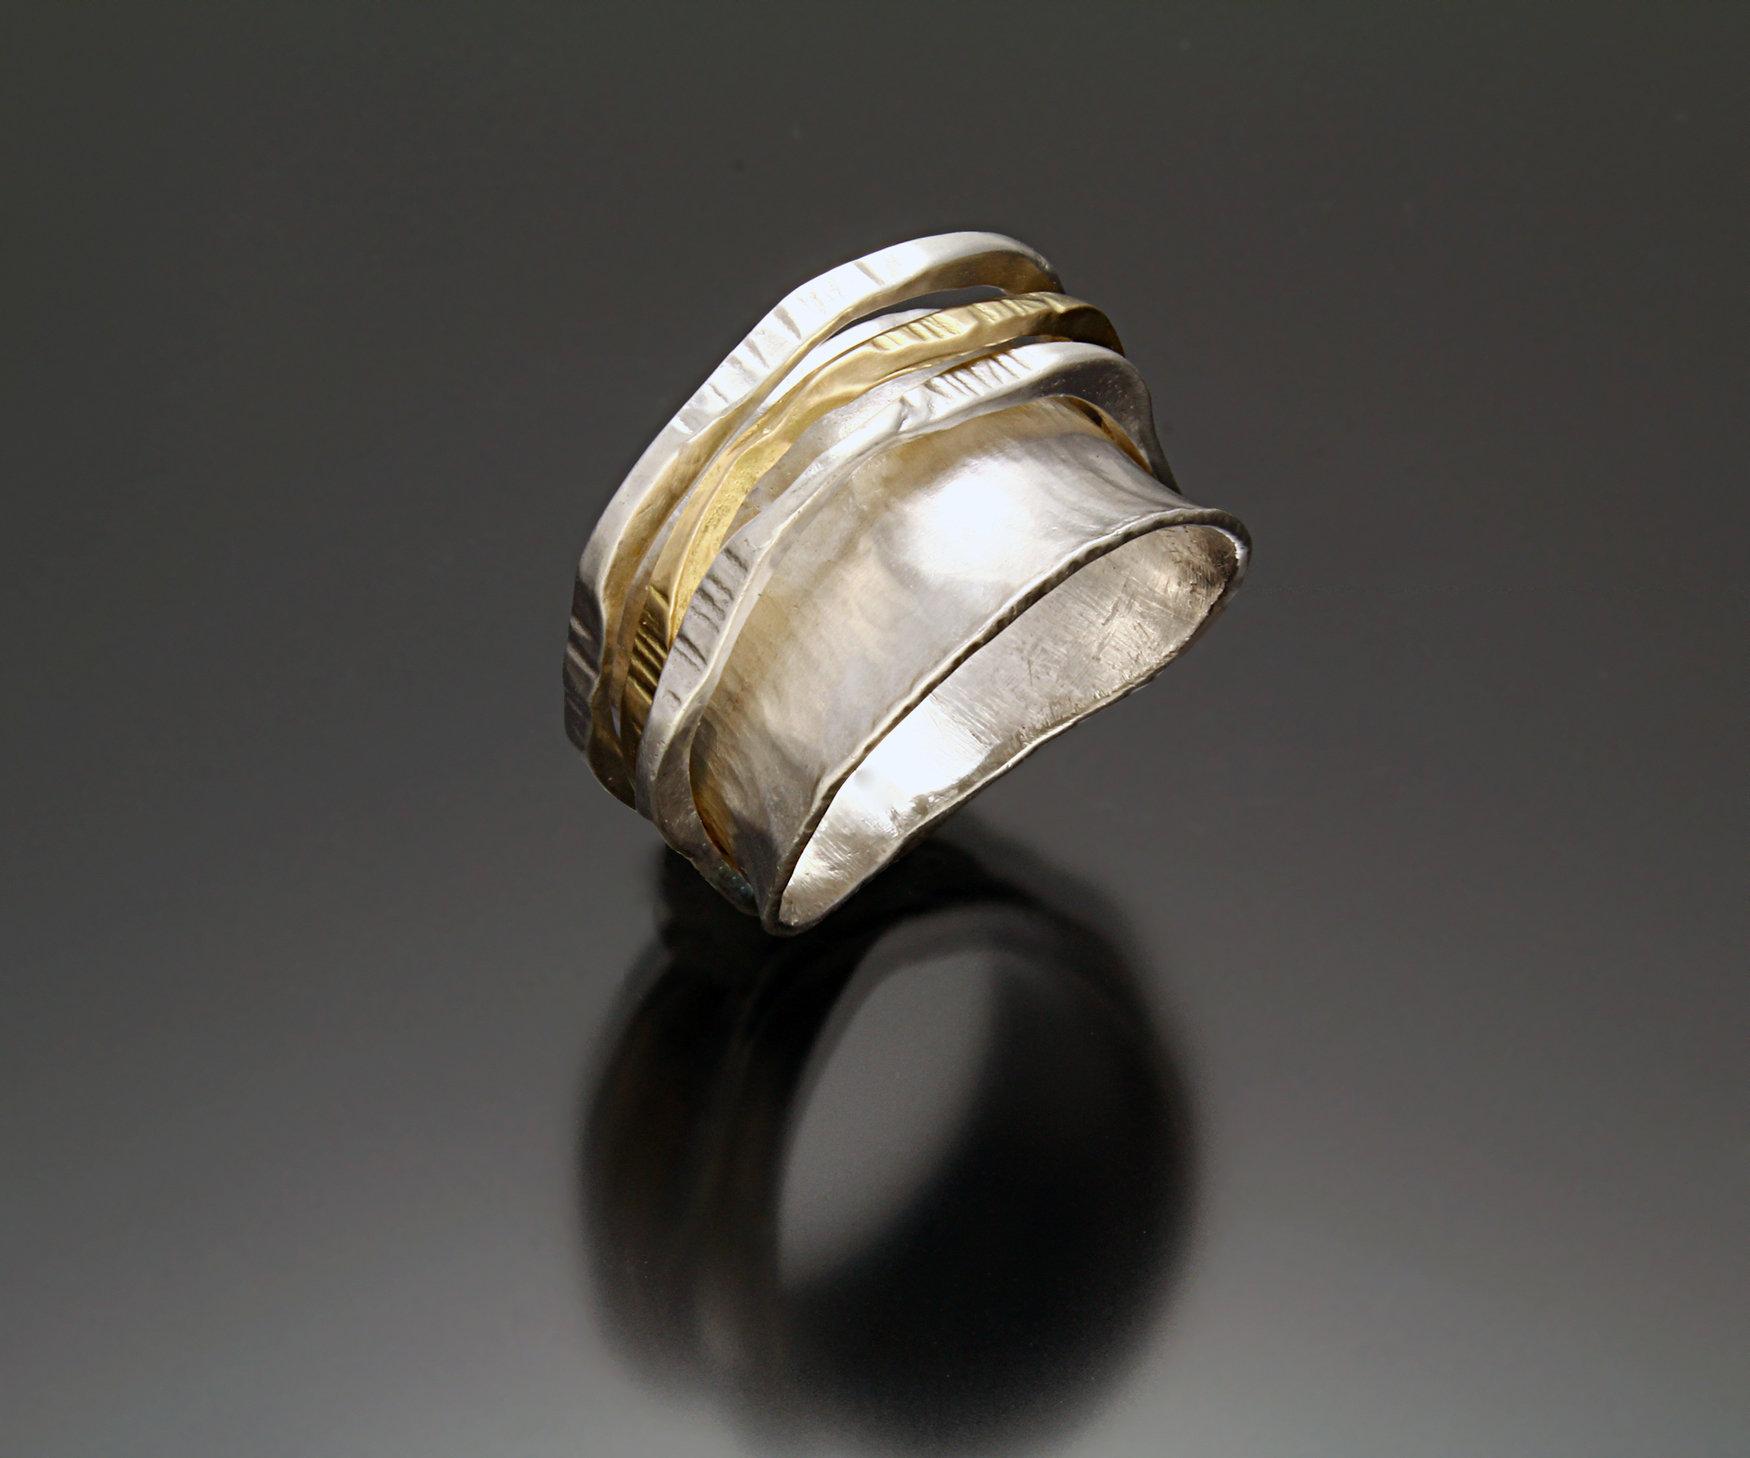 Gold Ring Forging